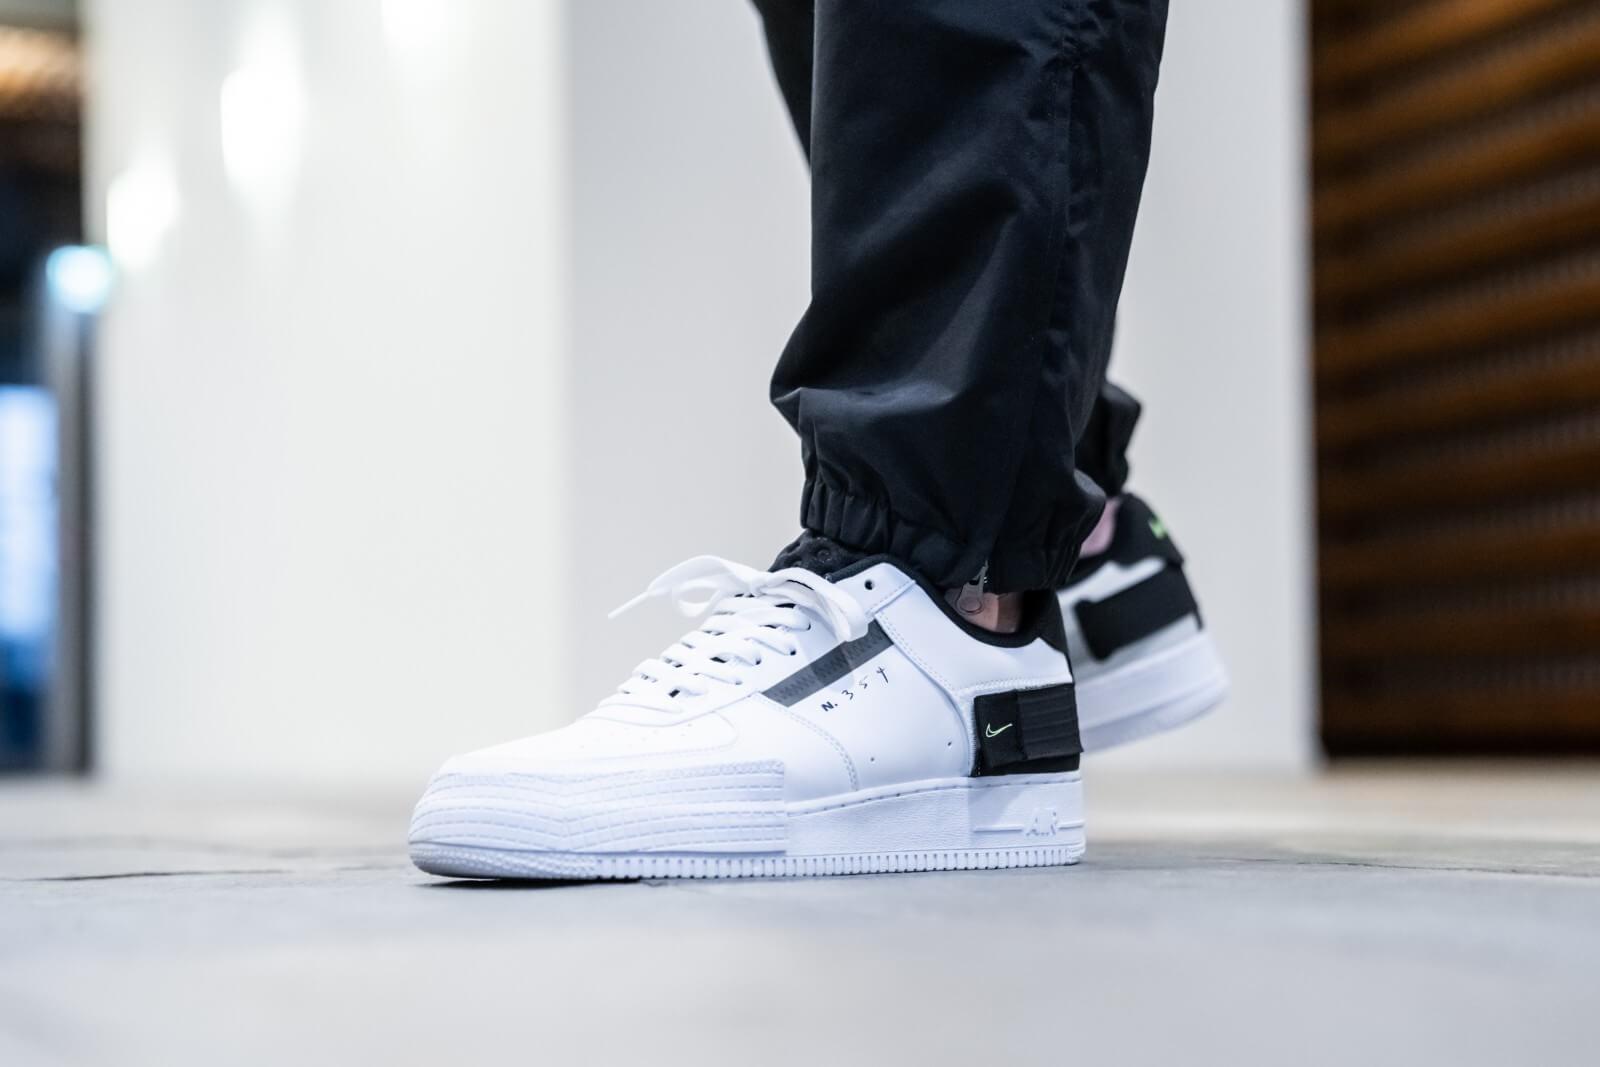 Nike Air Force 1 Type WhiteVolt Black AT7859 101